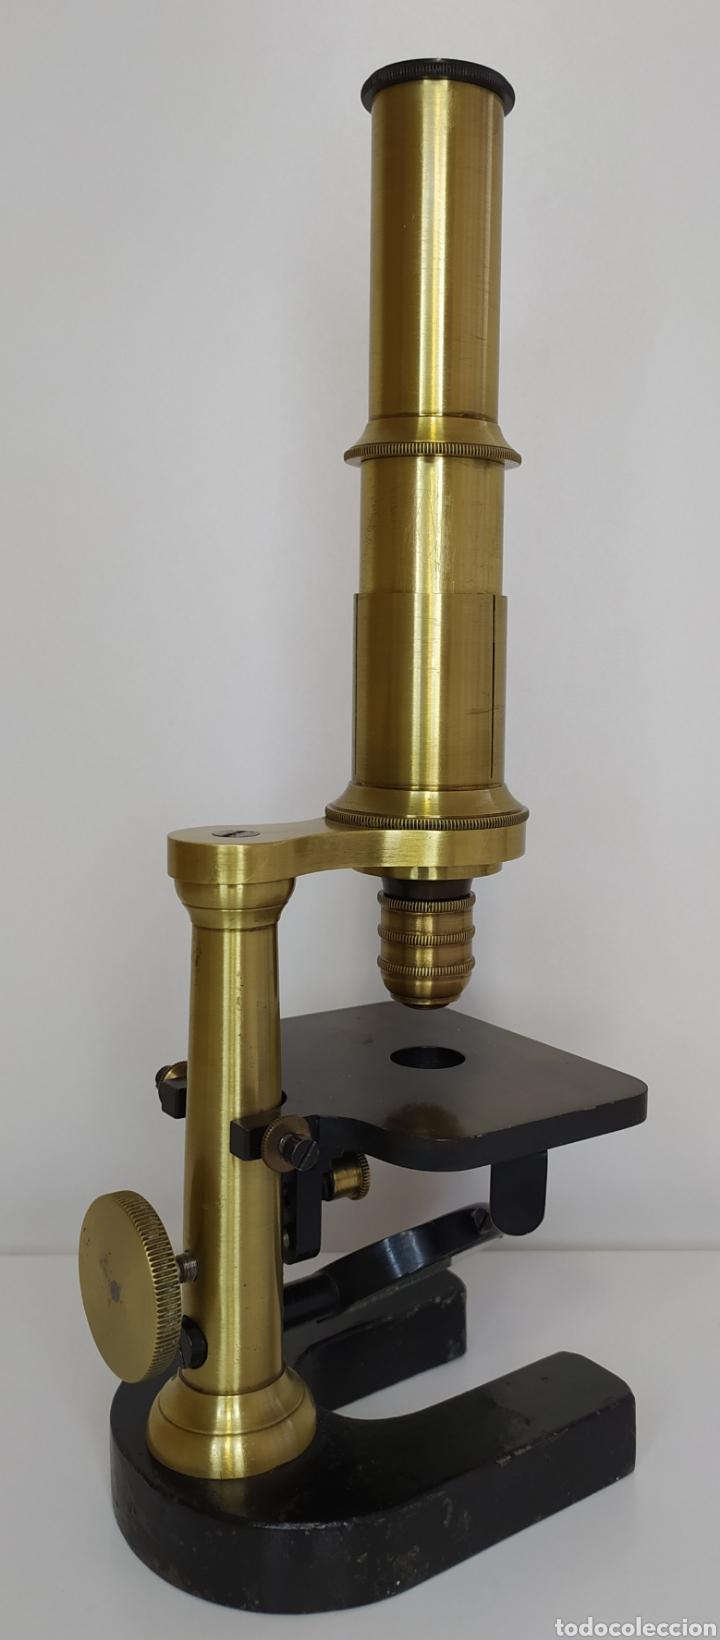 Antigüedades: Antiguo microscopio circa 1880. Tipo Schiek - Foto 21 - 253829690